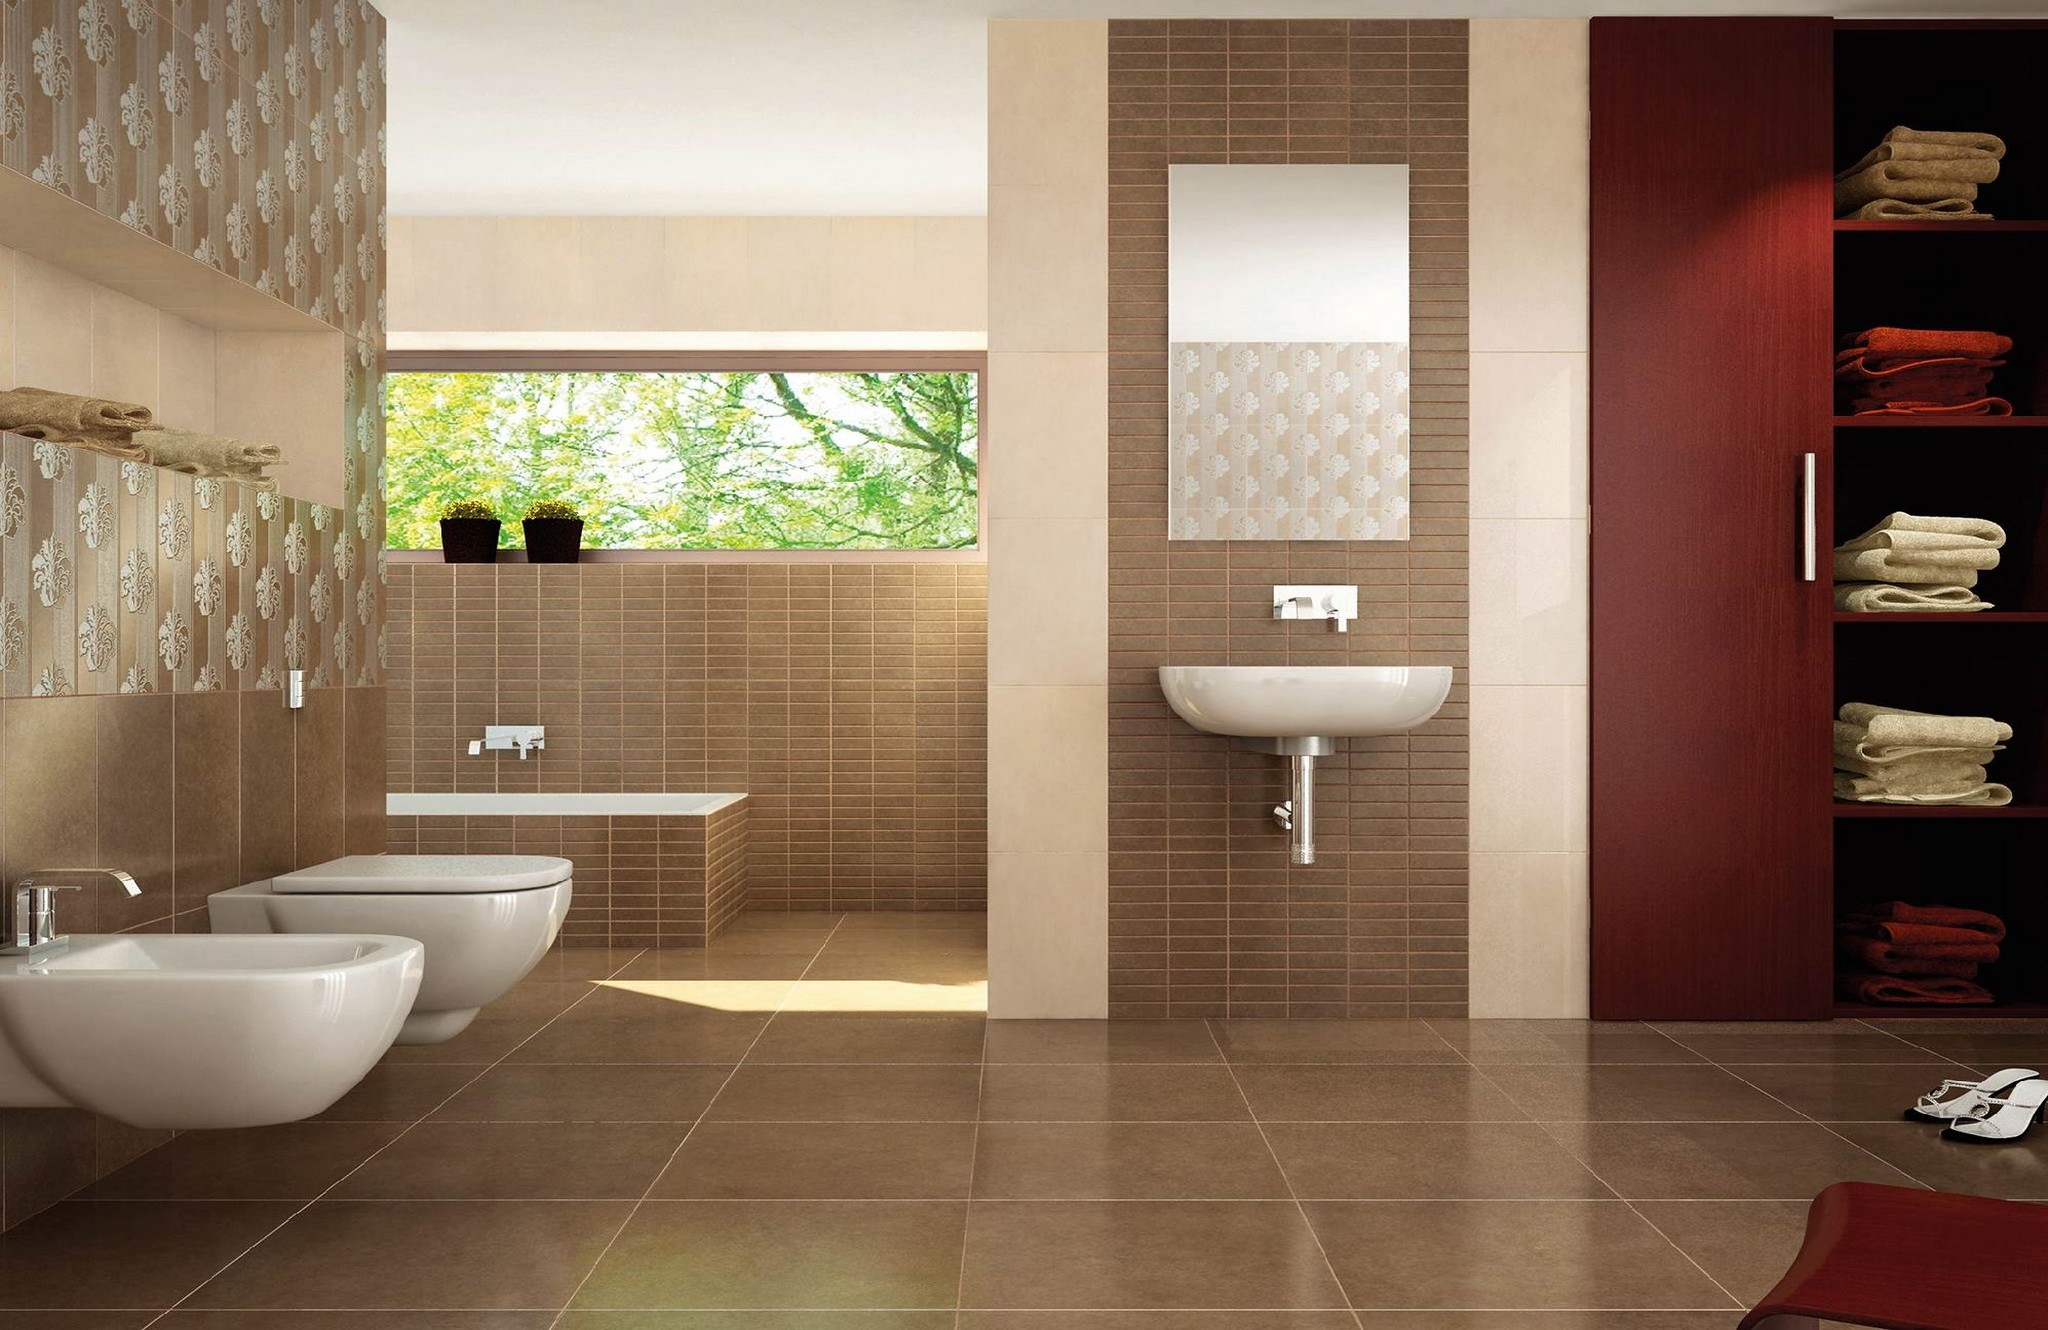 Faience salle de bain cifre serie boston 25x40 1 choix for Fayence salle de bain